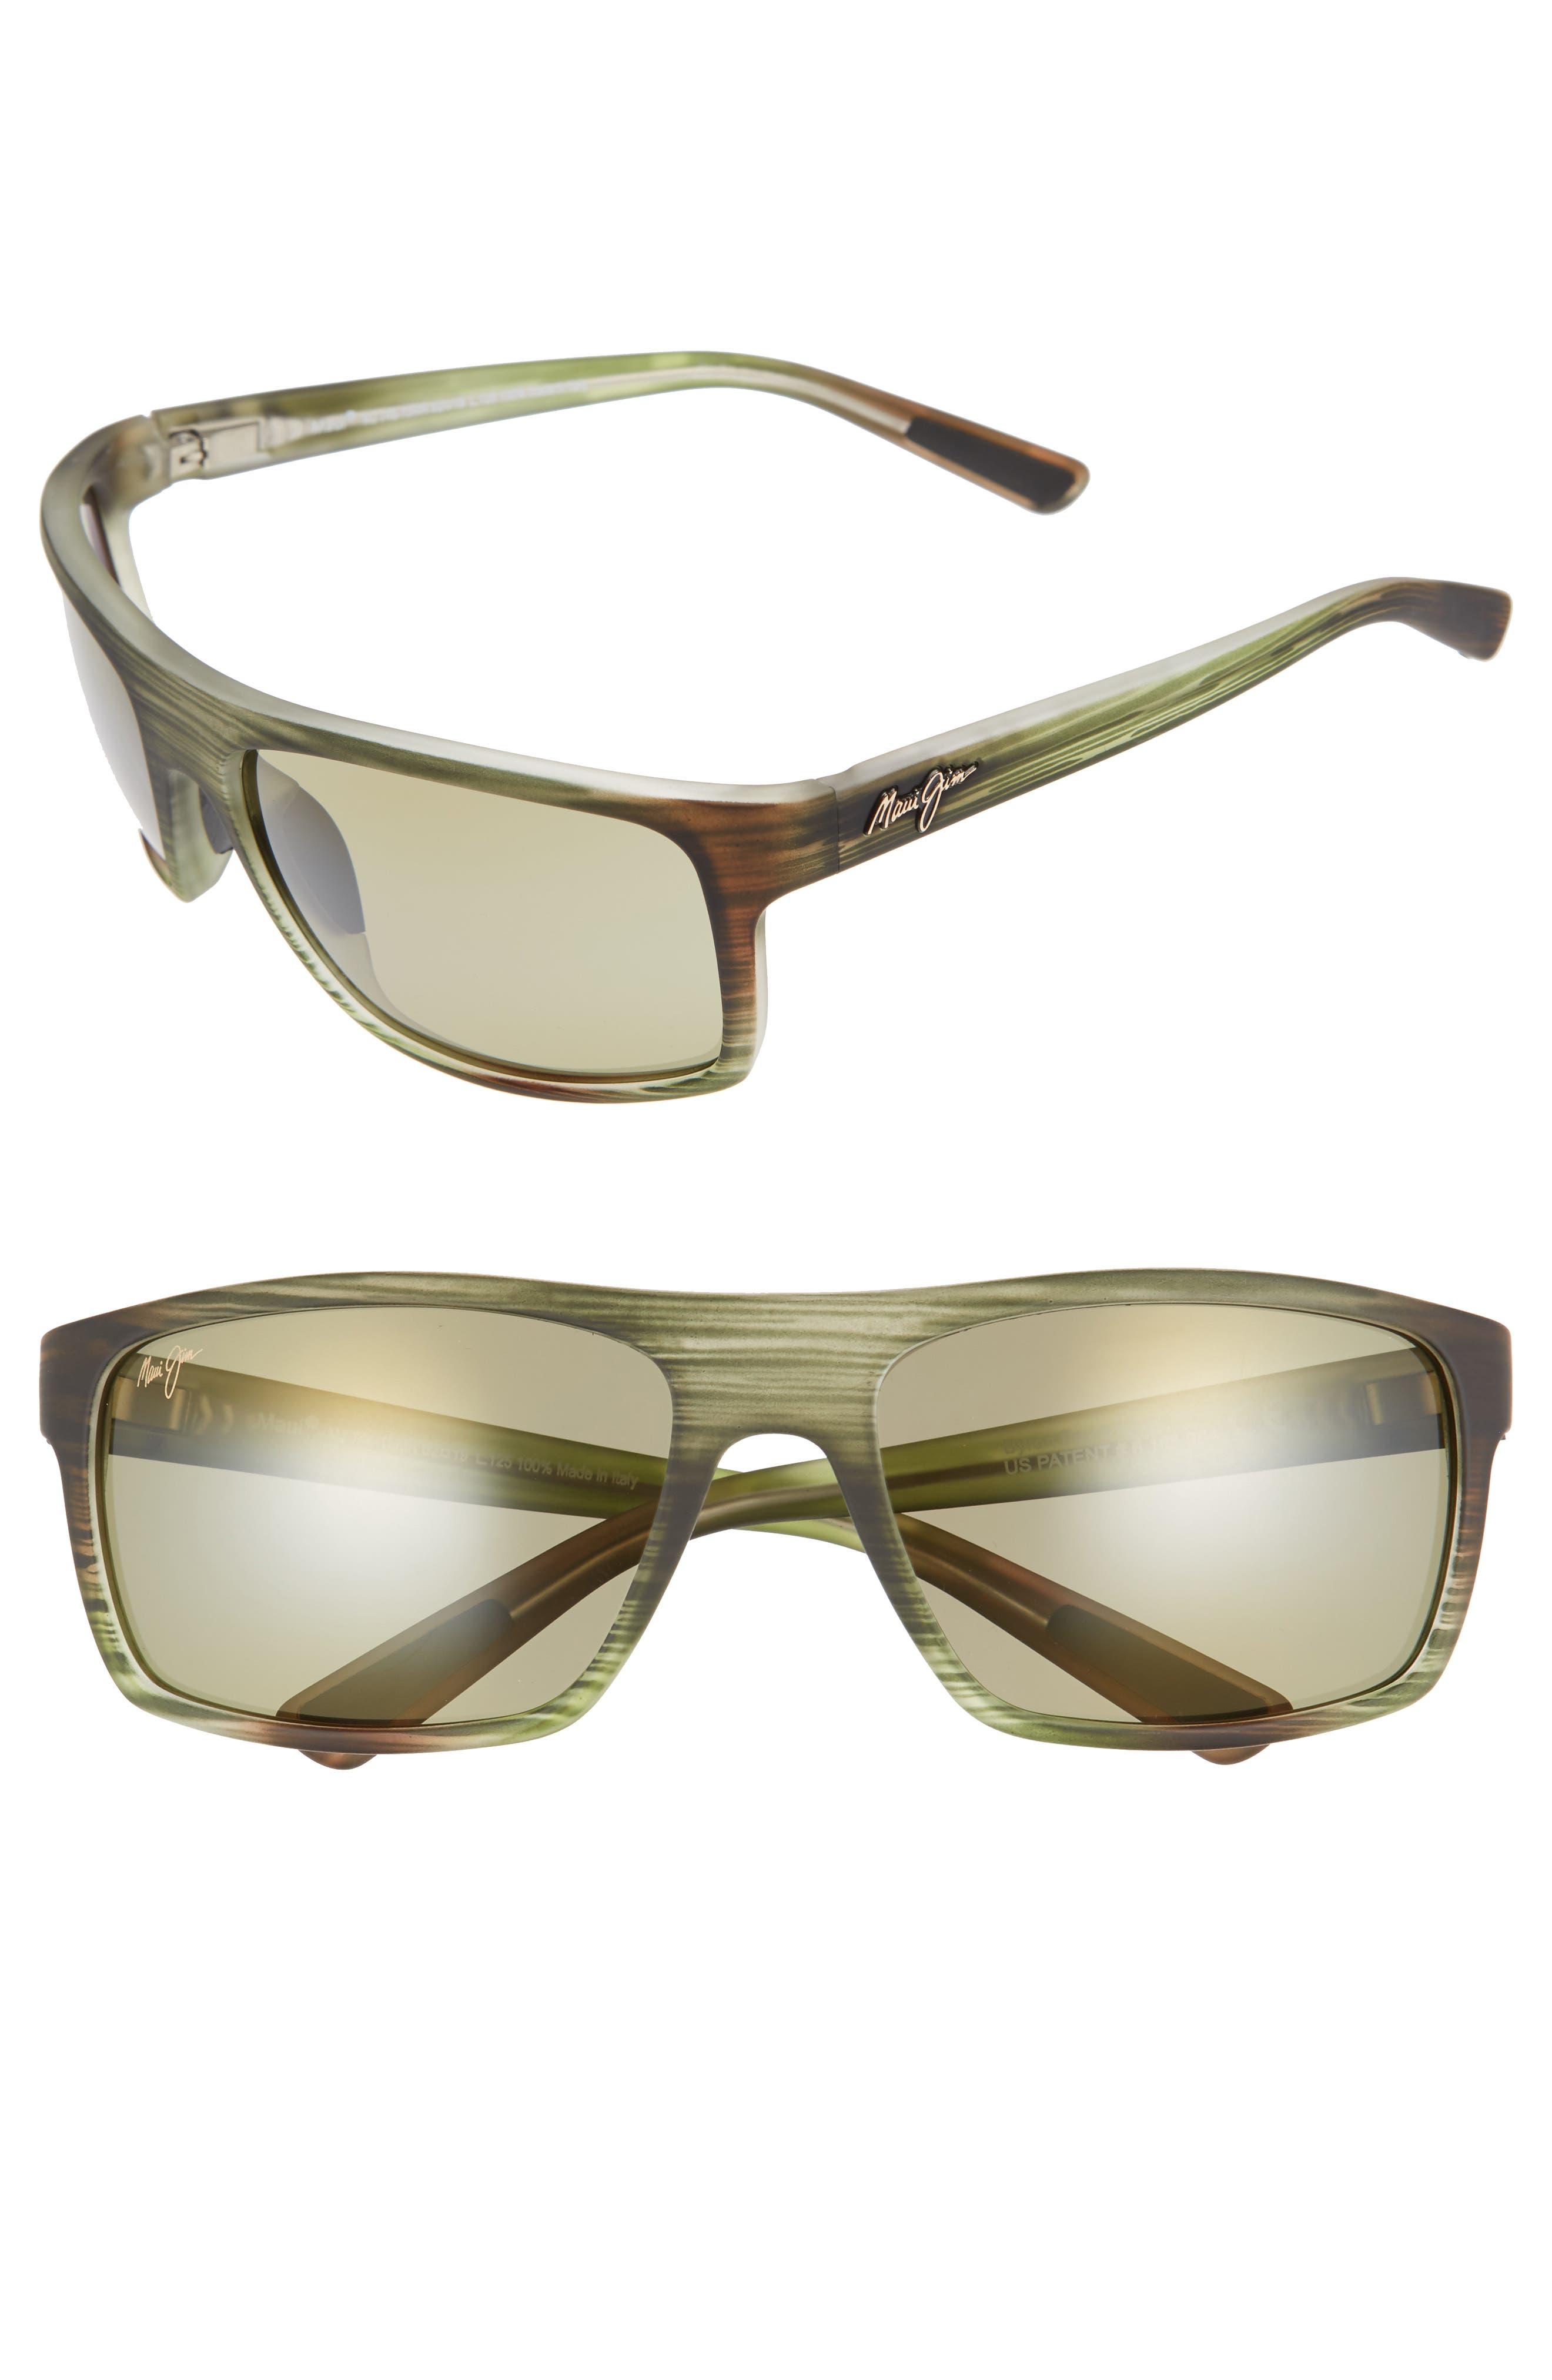 MAUI JIM Byron Bay 62mm Polarized Sunglasses